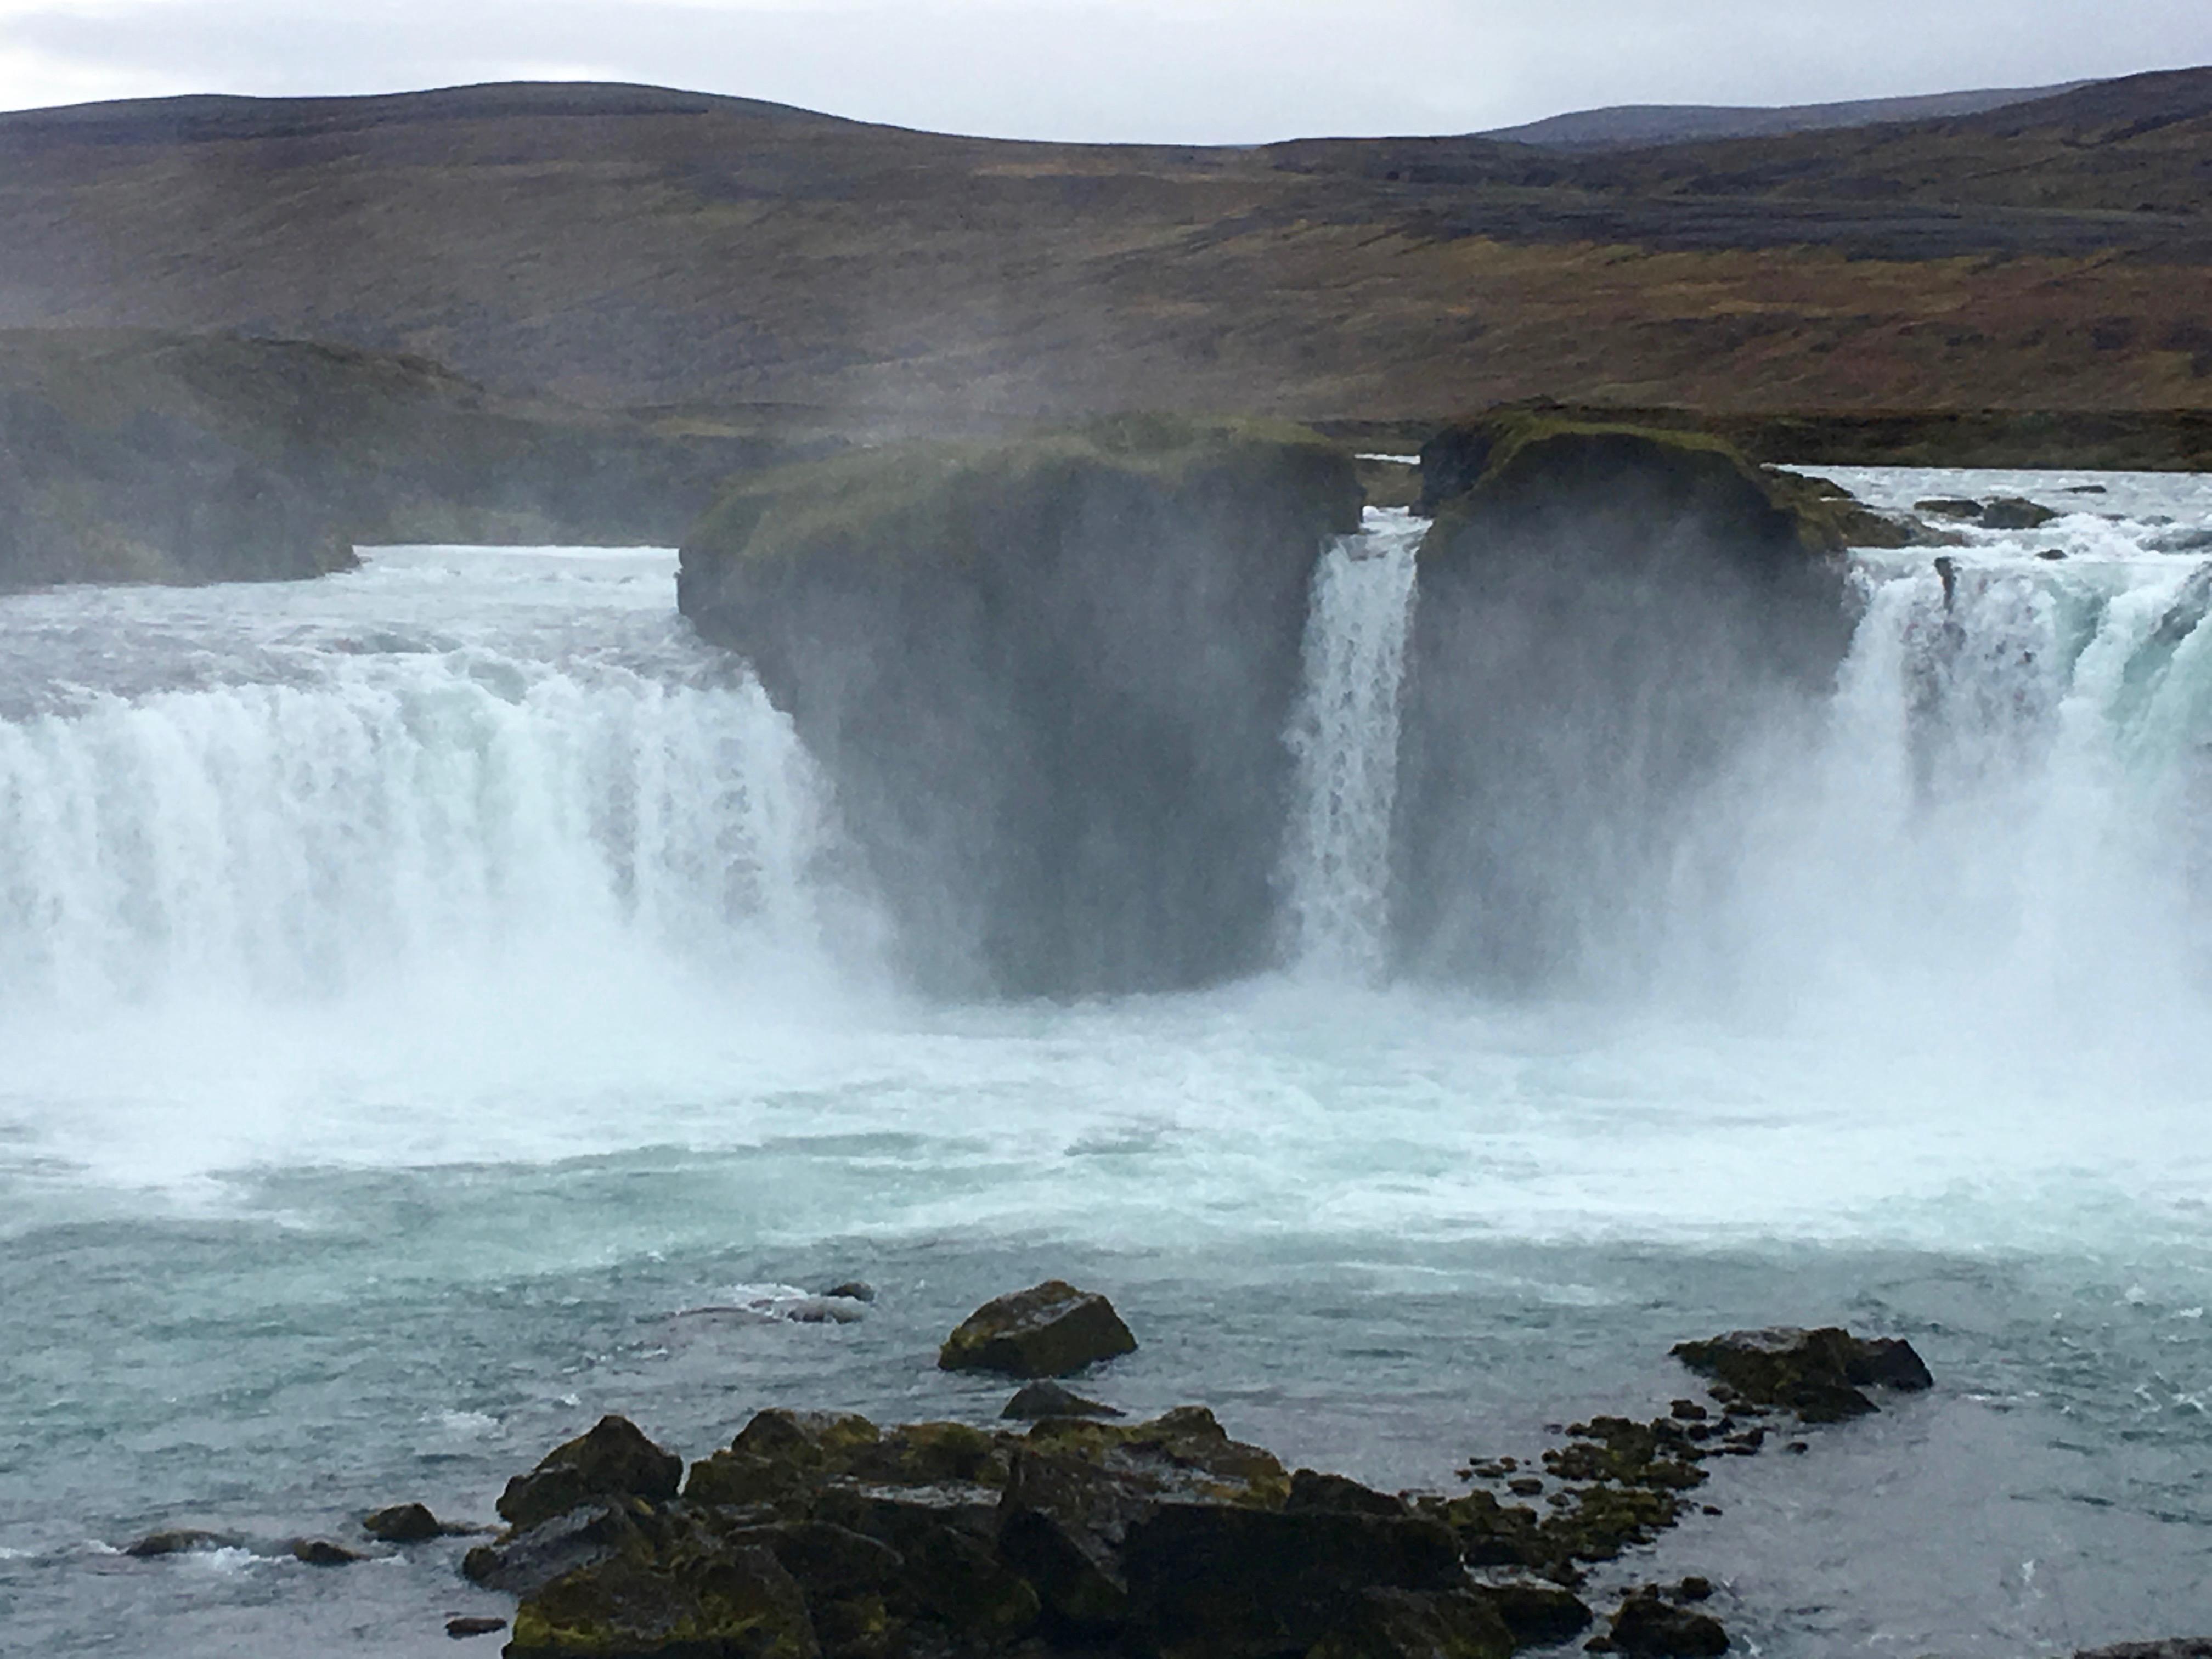 Iceland is full of waterfalls. Photo: Tonya Fitzpatrick